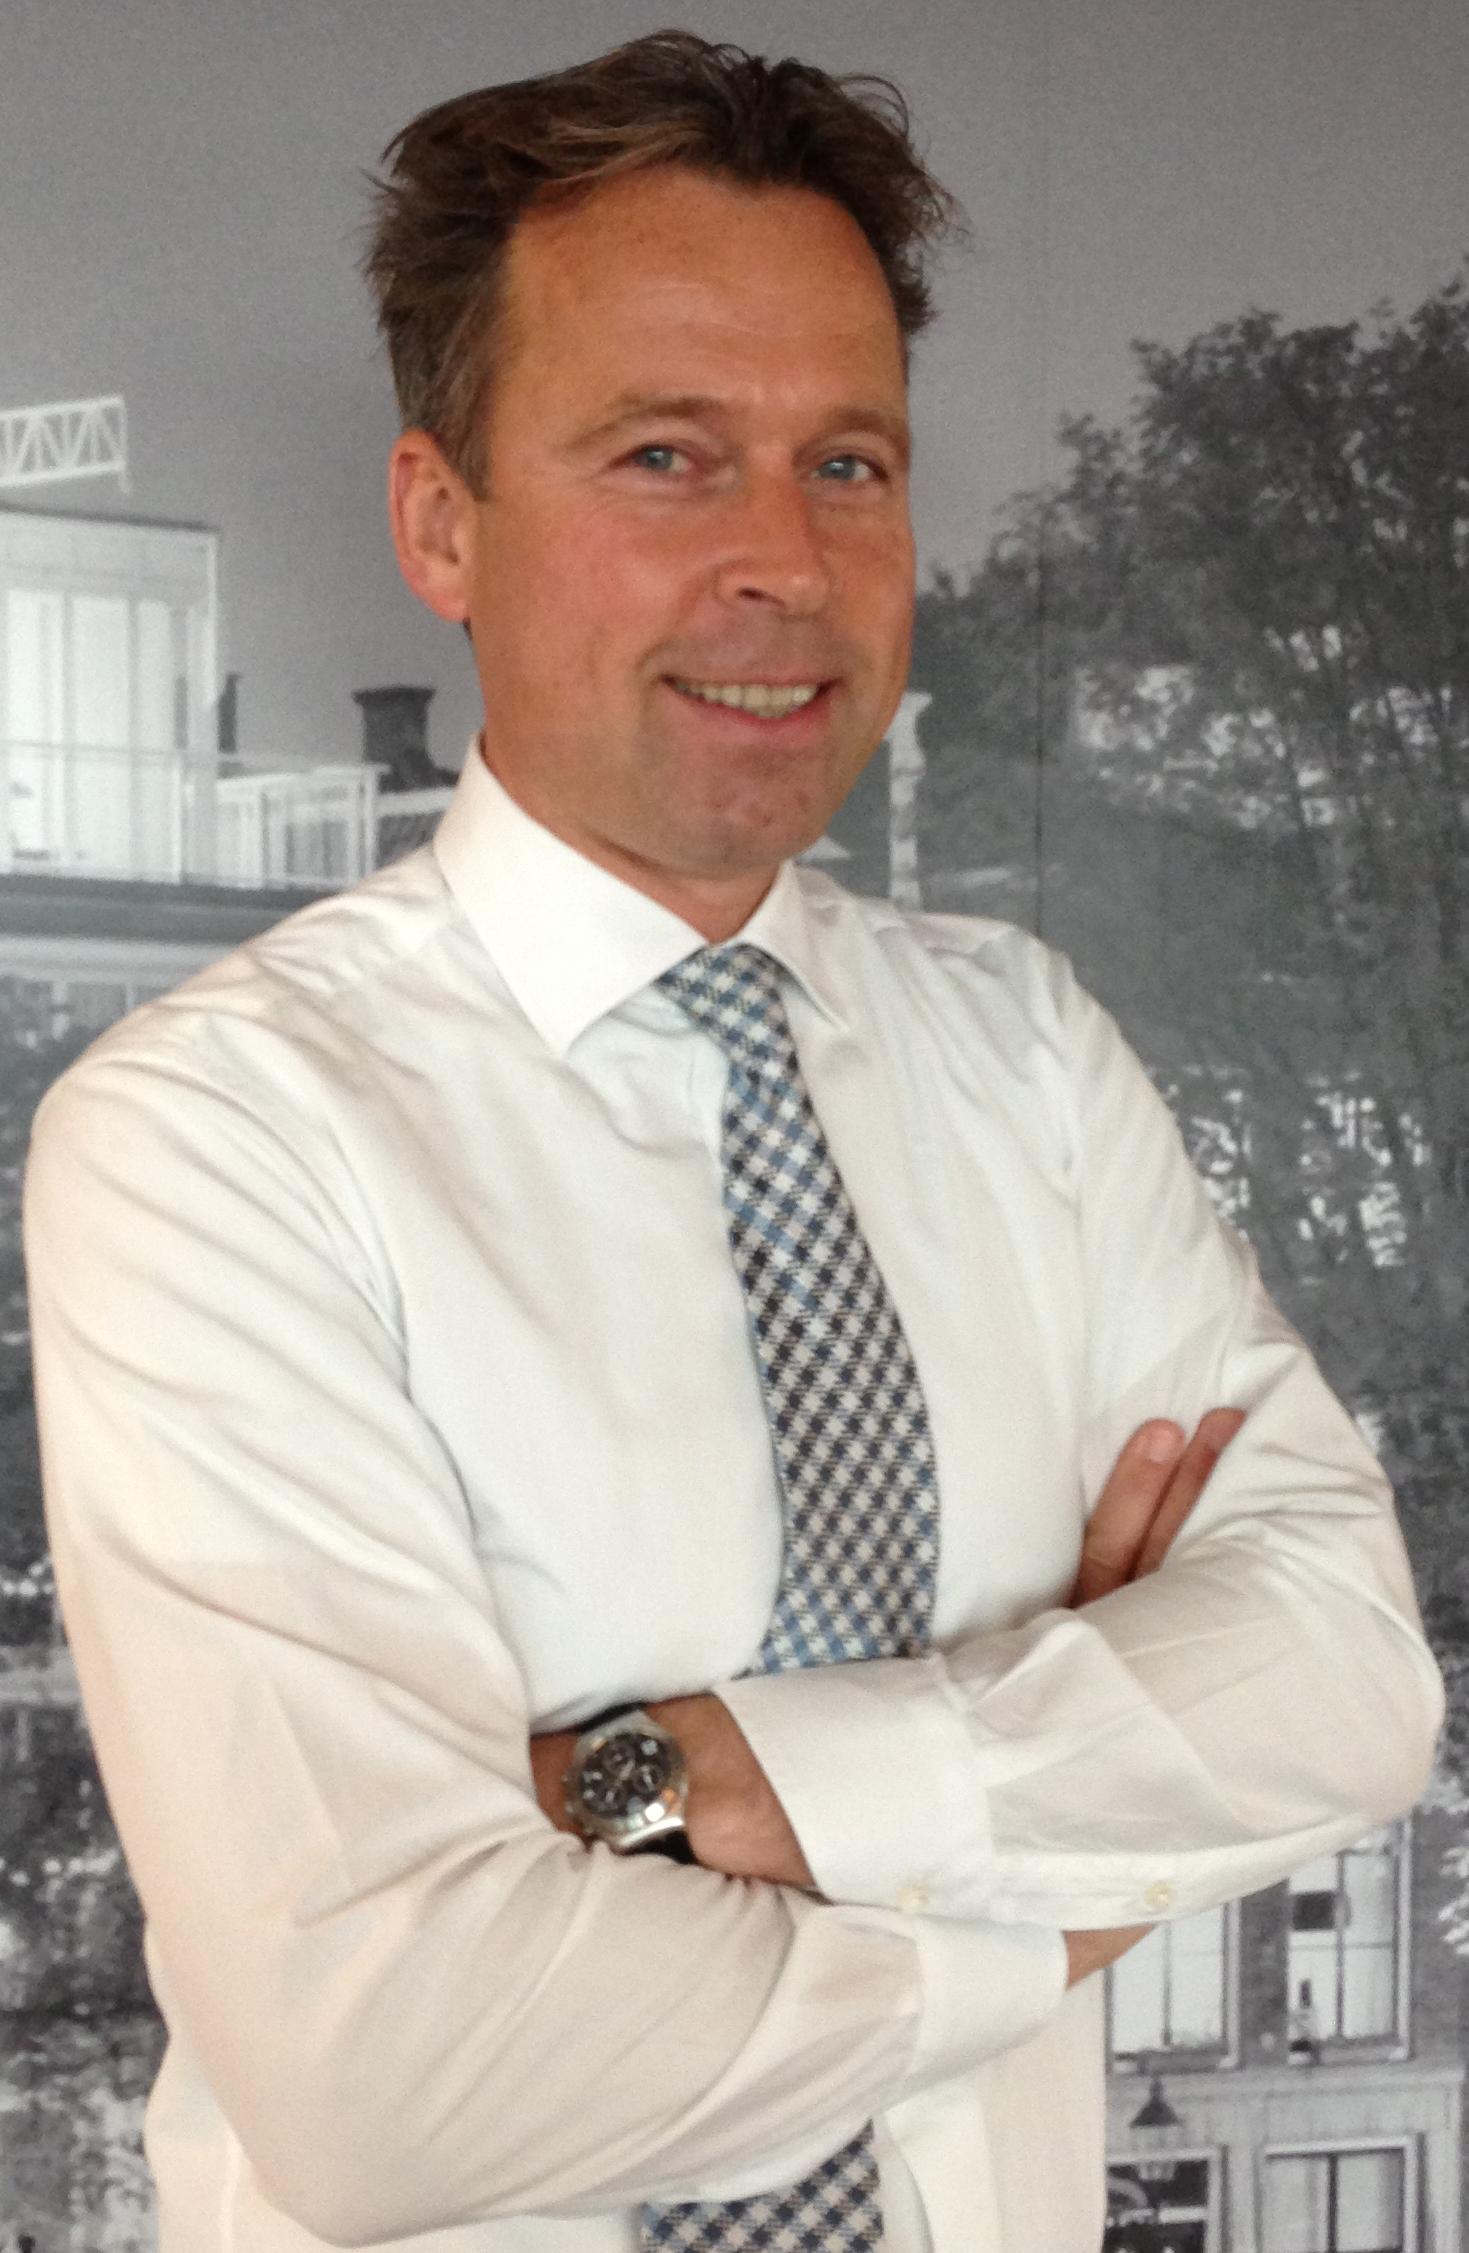 Ivo Aris, director of global forwarding, Europe at C.H. Robinson (Photo: C.H. Robinson)